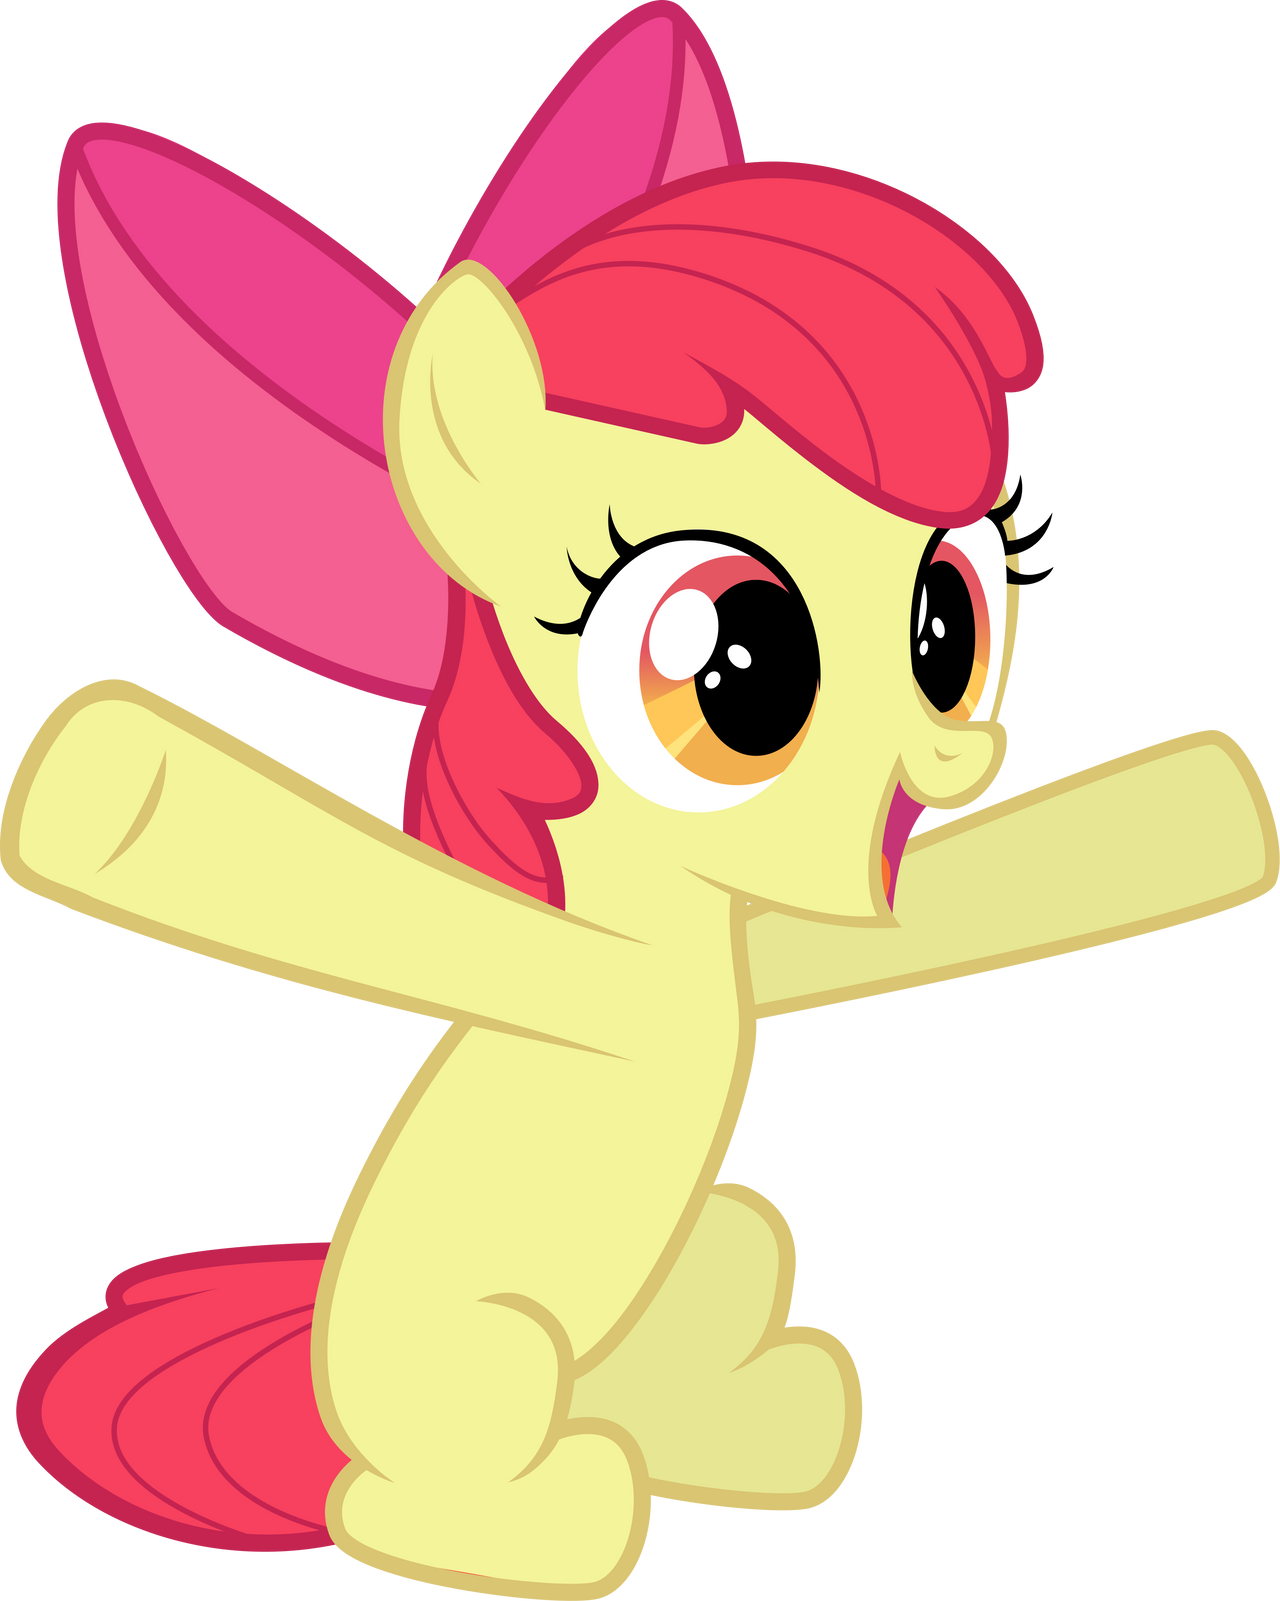 Apple Bloom Just Wants a Hug by tamalesyatole